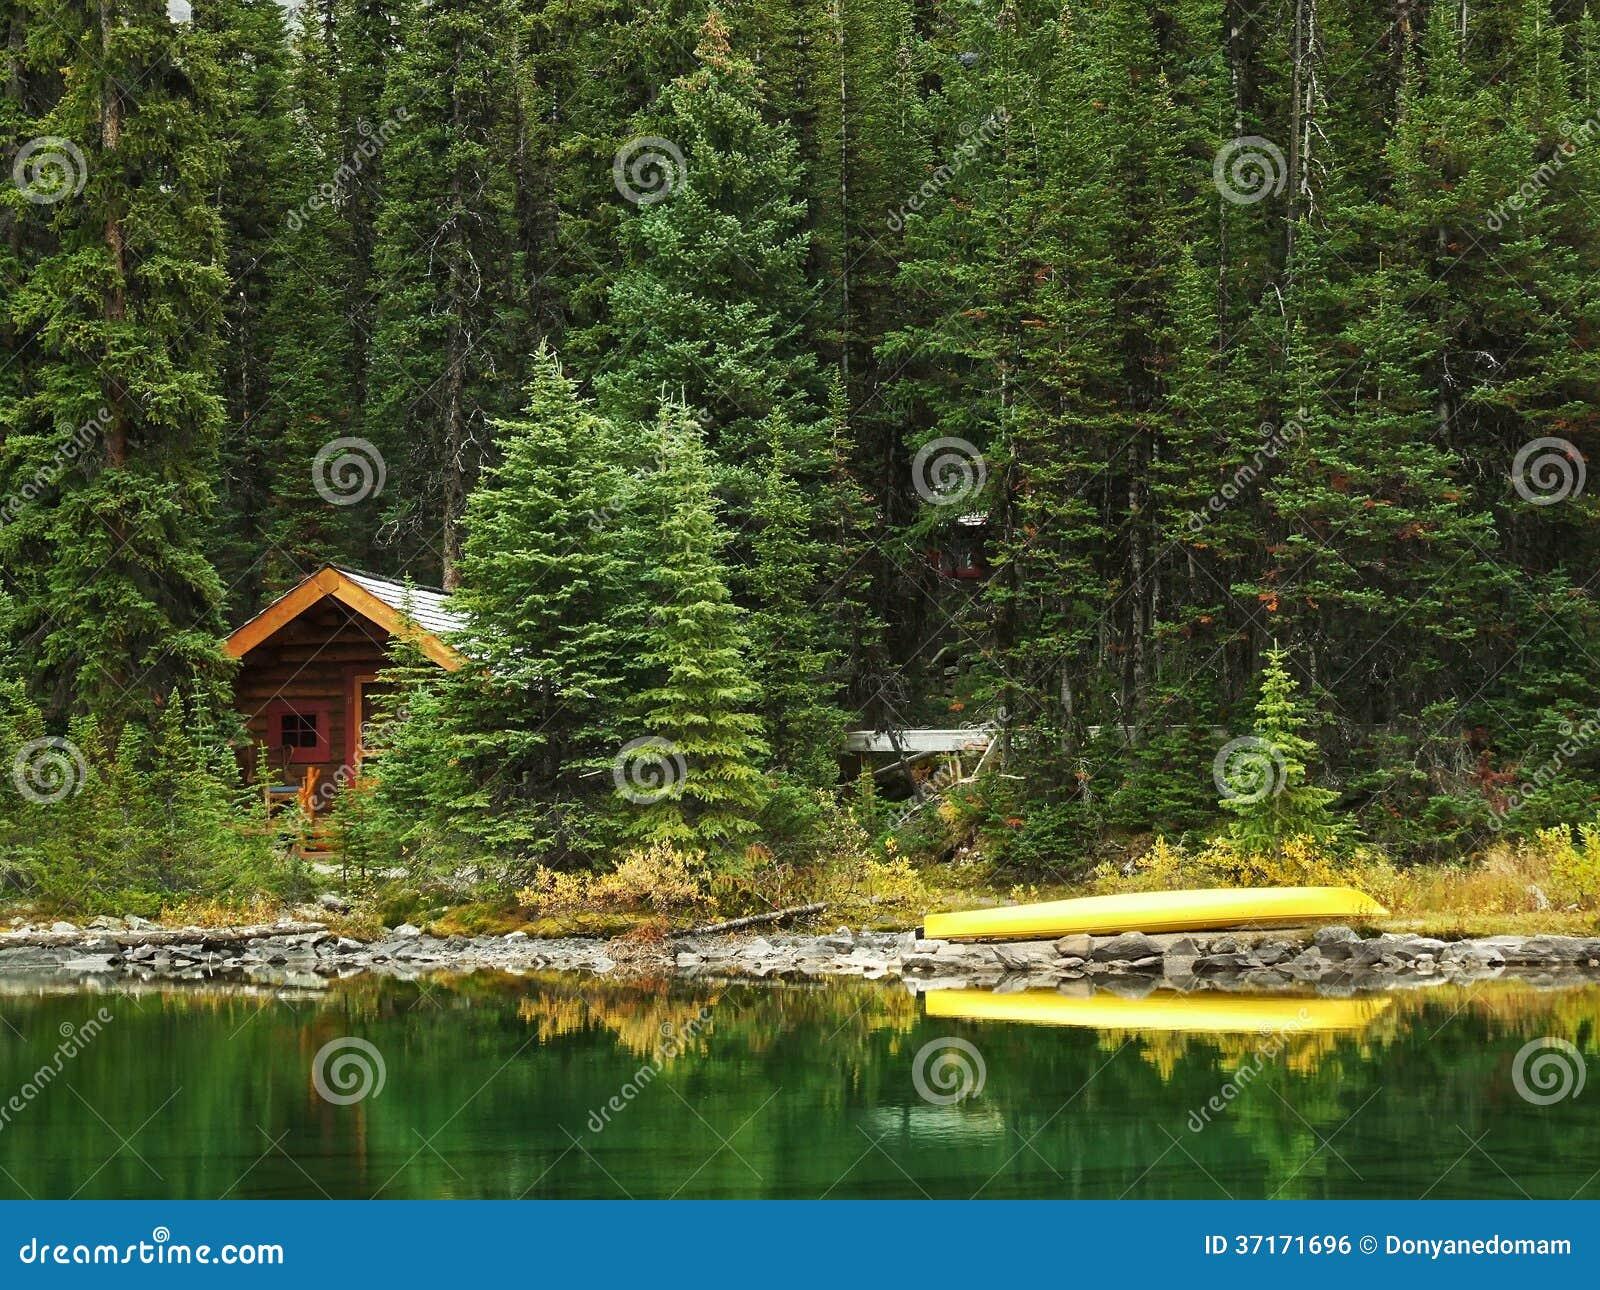 Houten cabine bij meer o 39 hara yoho national park canada for Cabine al lago shadd